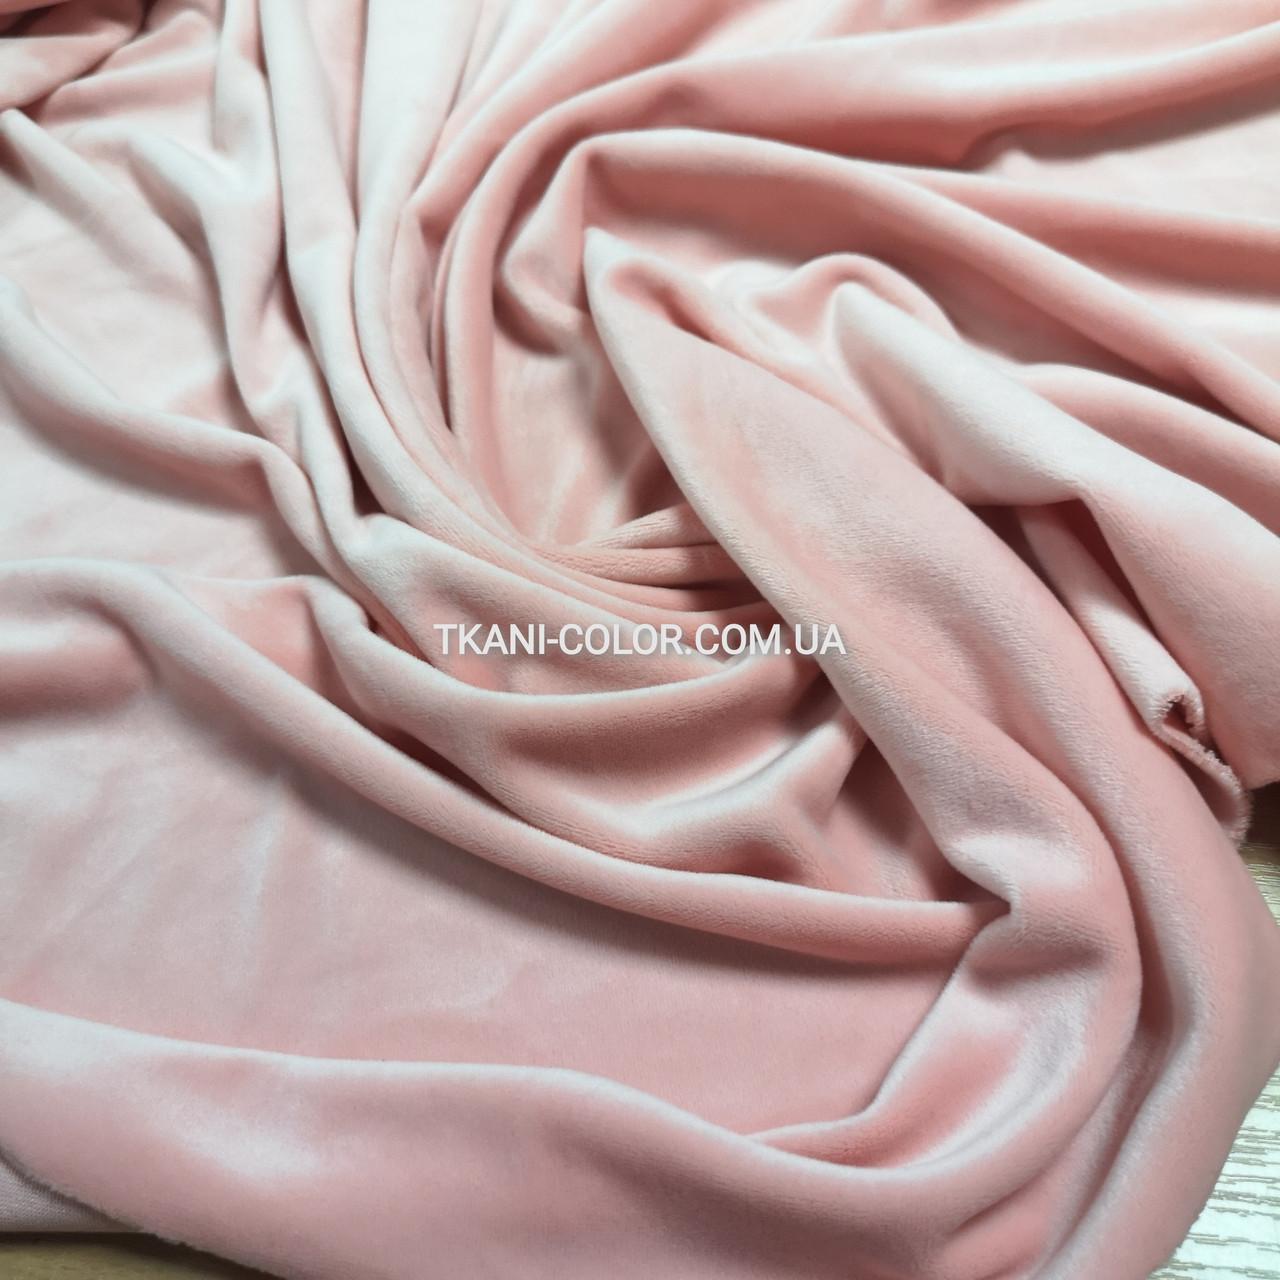 Ткань плюш велюр персиковый